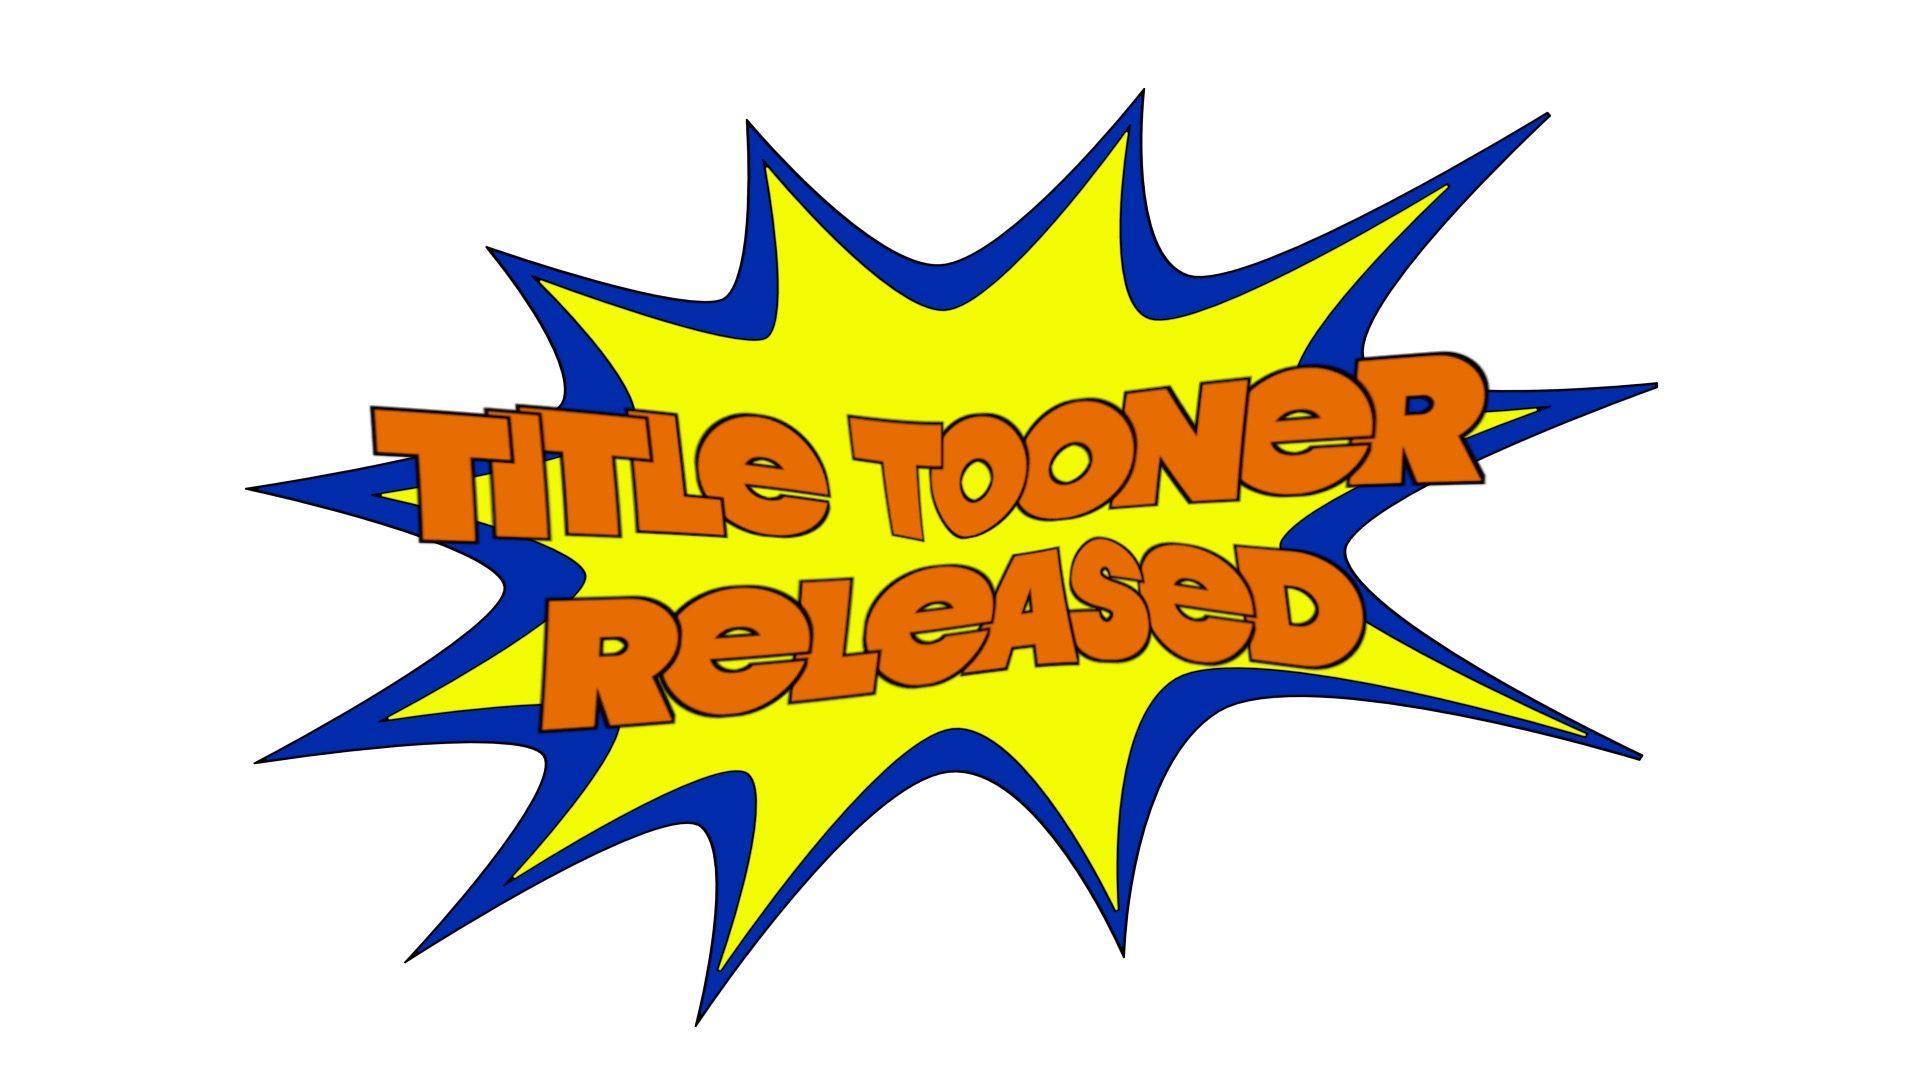 Title Tooner Released image